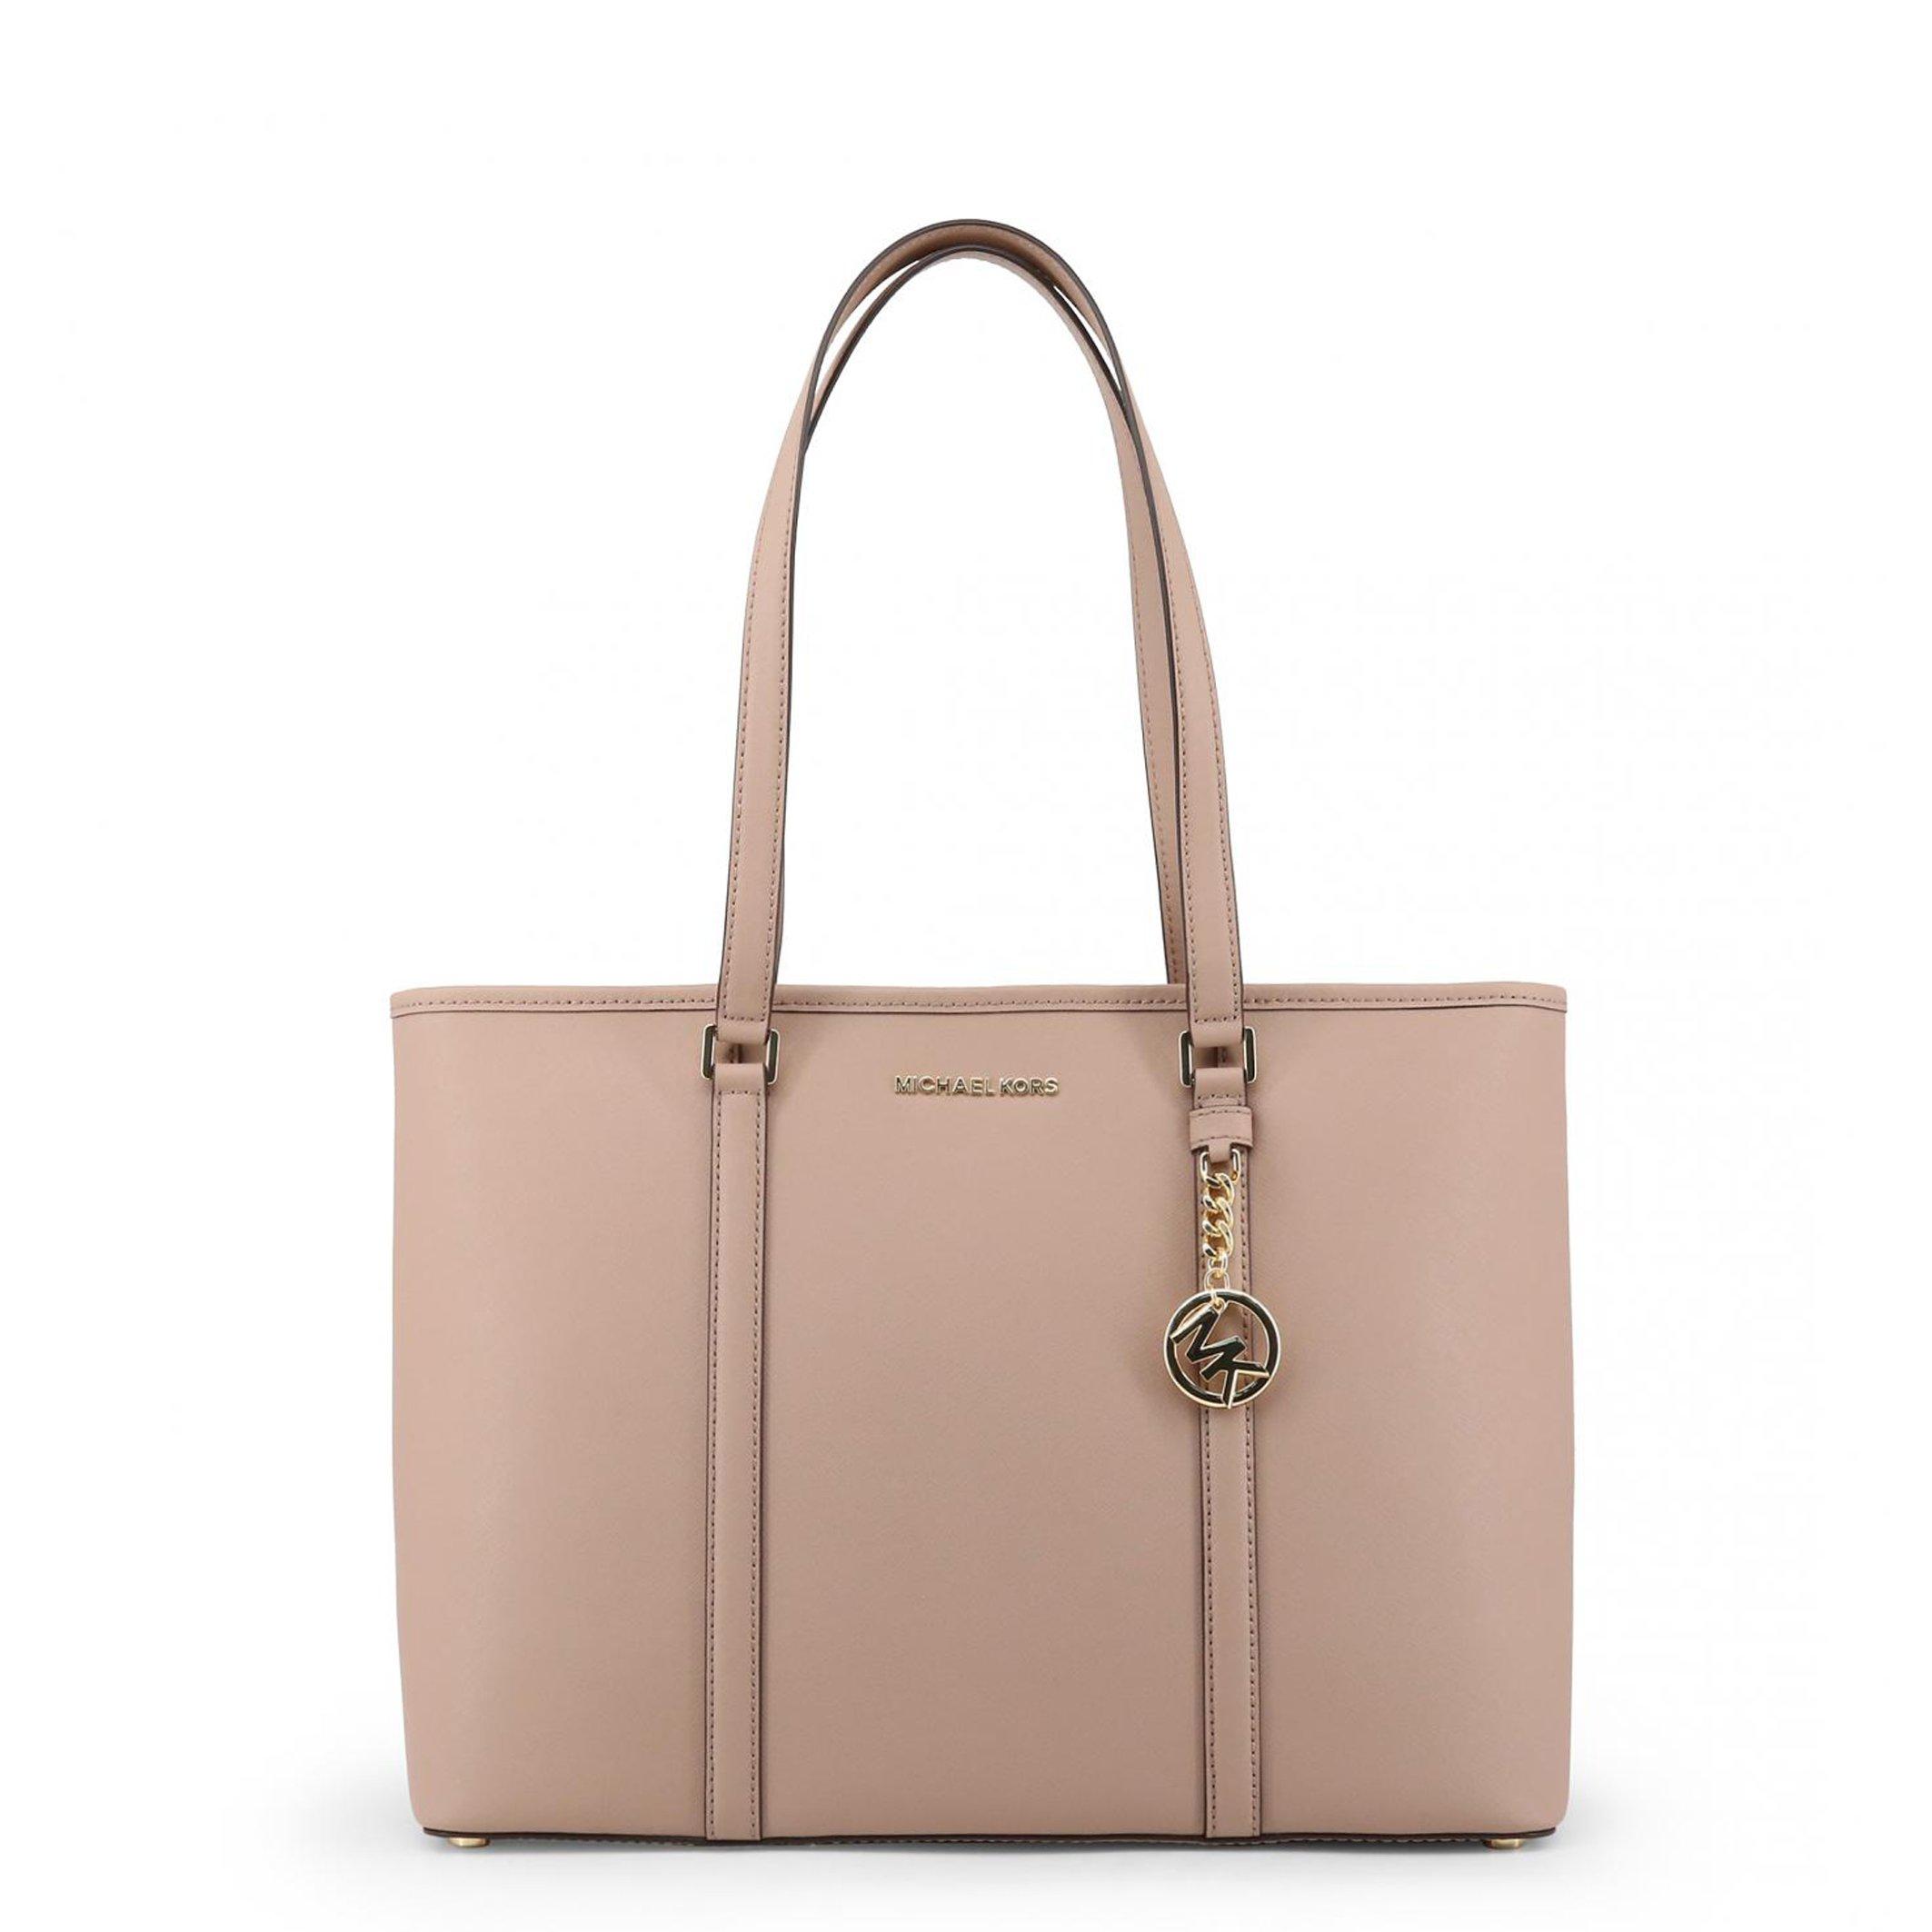 Michael Kors Women's Shopping Bag Brown SADY_35T7GD4T7L - pink NOSIZE